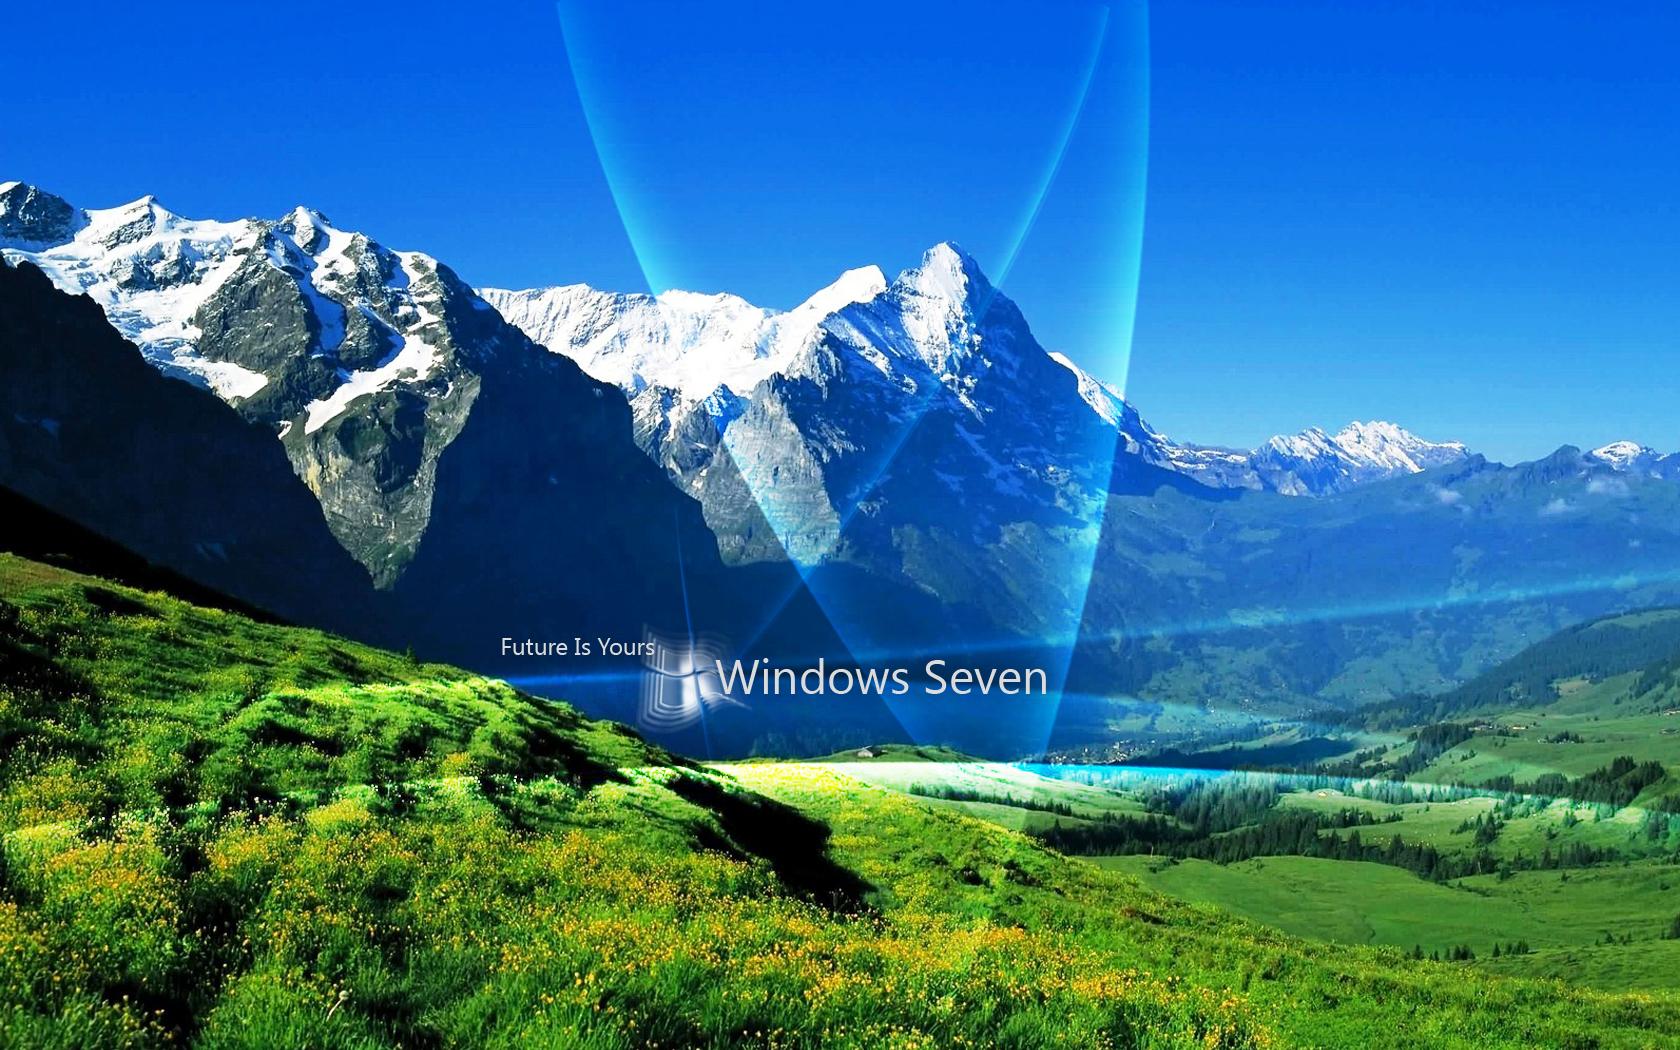 windows vista live wallpaper - wallpapersafari